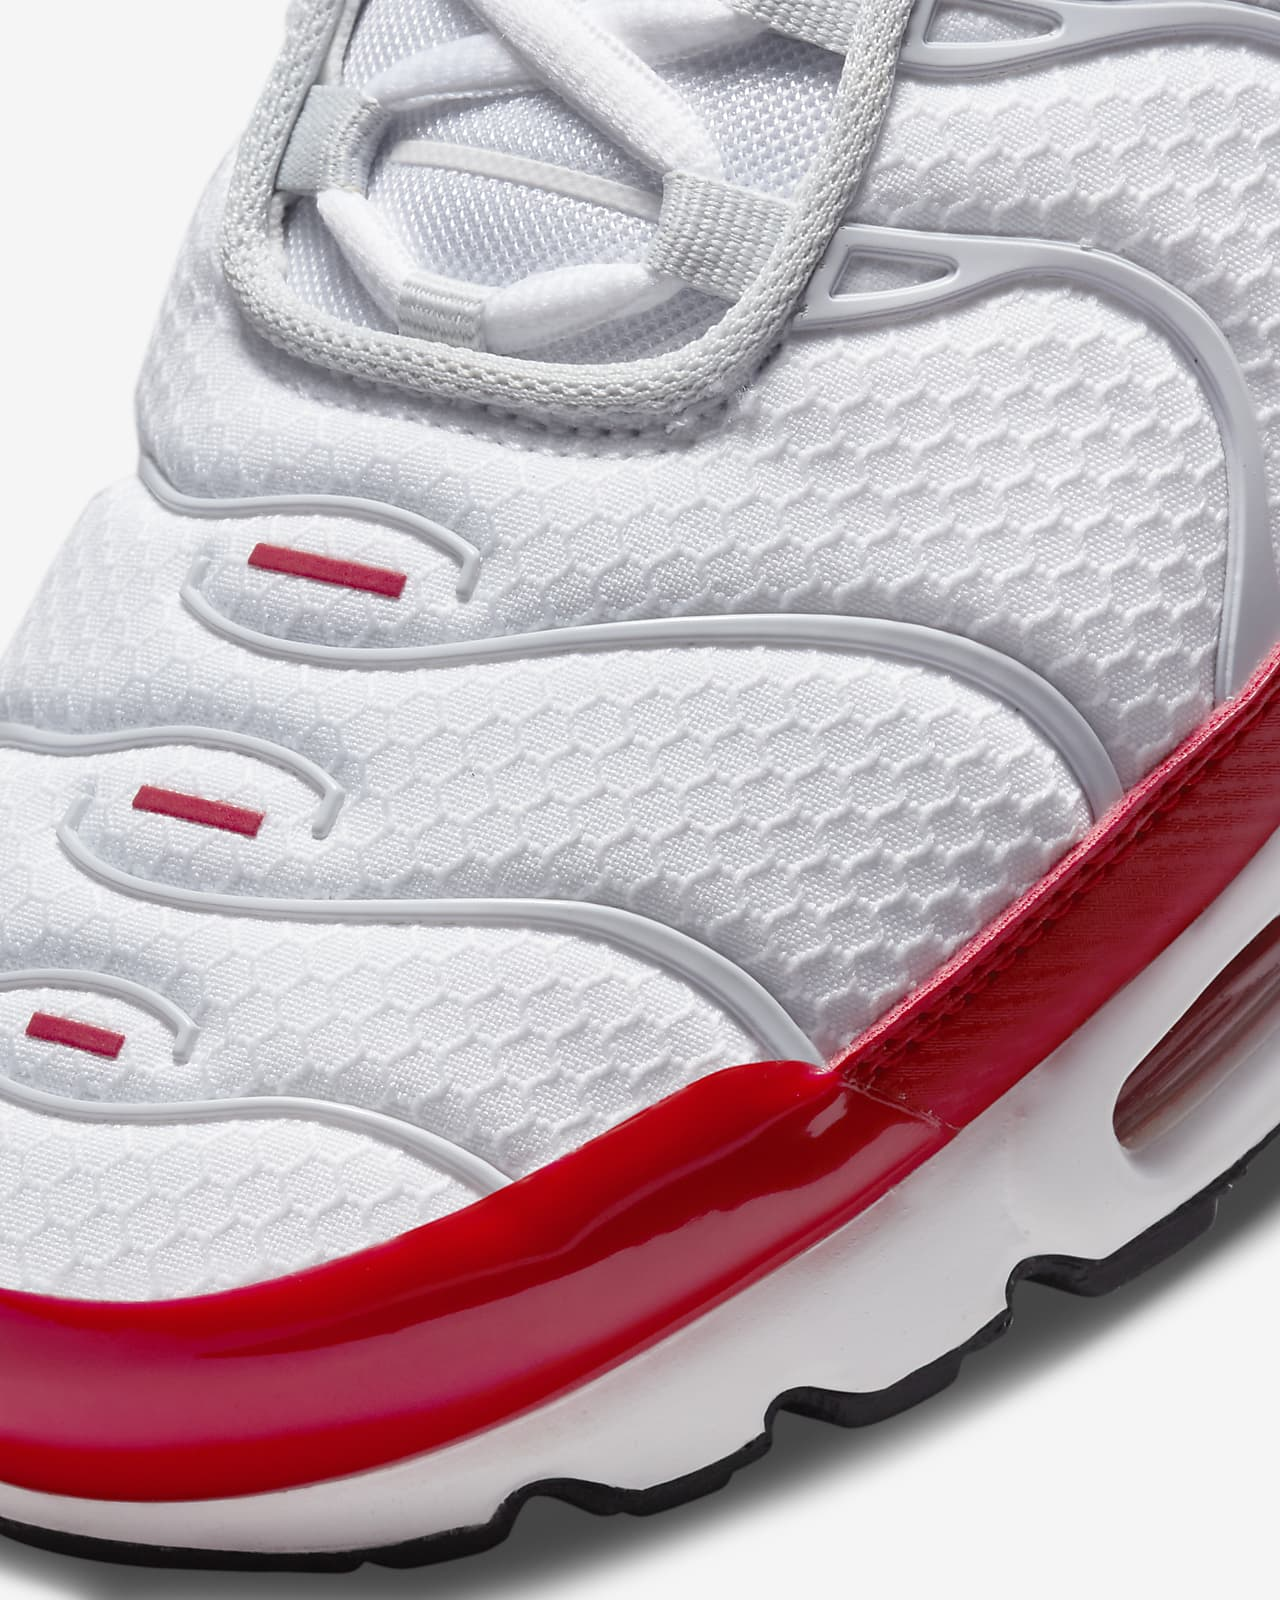 Nike Air Max Plus Men's Shoes. Nike AE